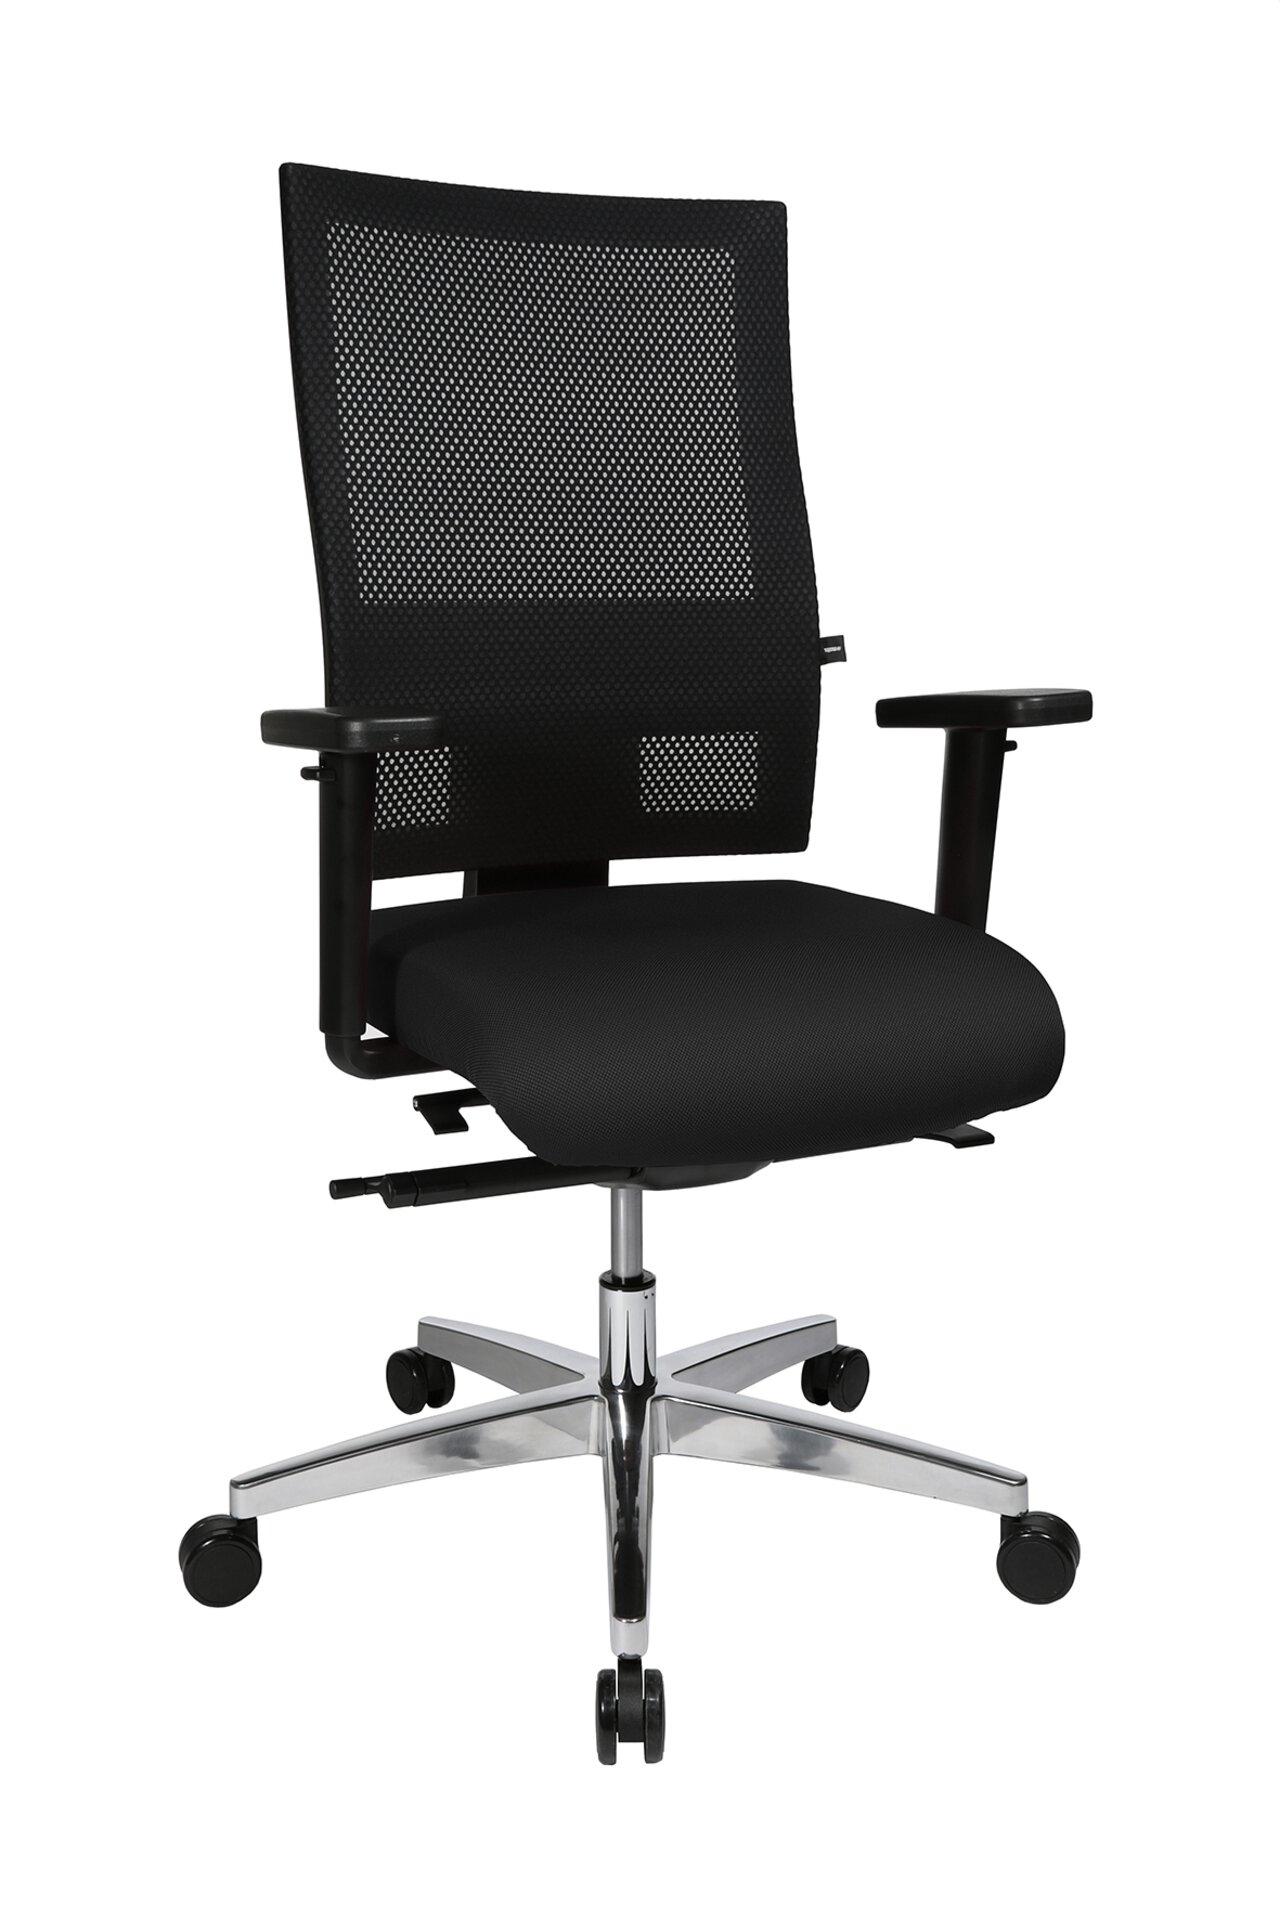 Büro-Drehstuhl SITNESS PROFI 200 Topstar Textil schwarz 64 x 113 x 59 cm